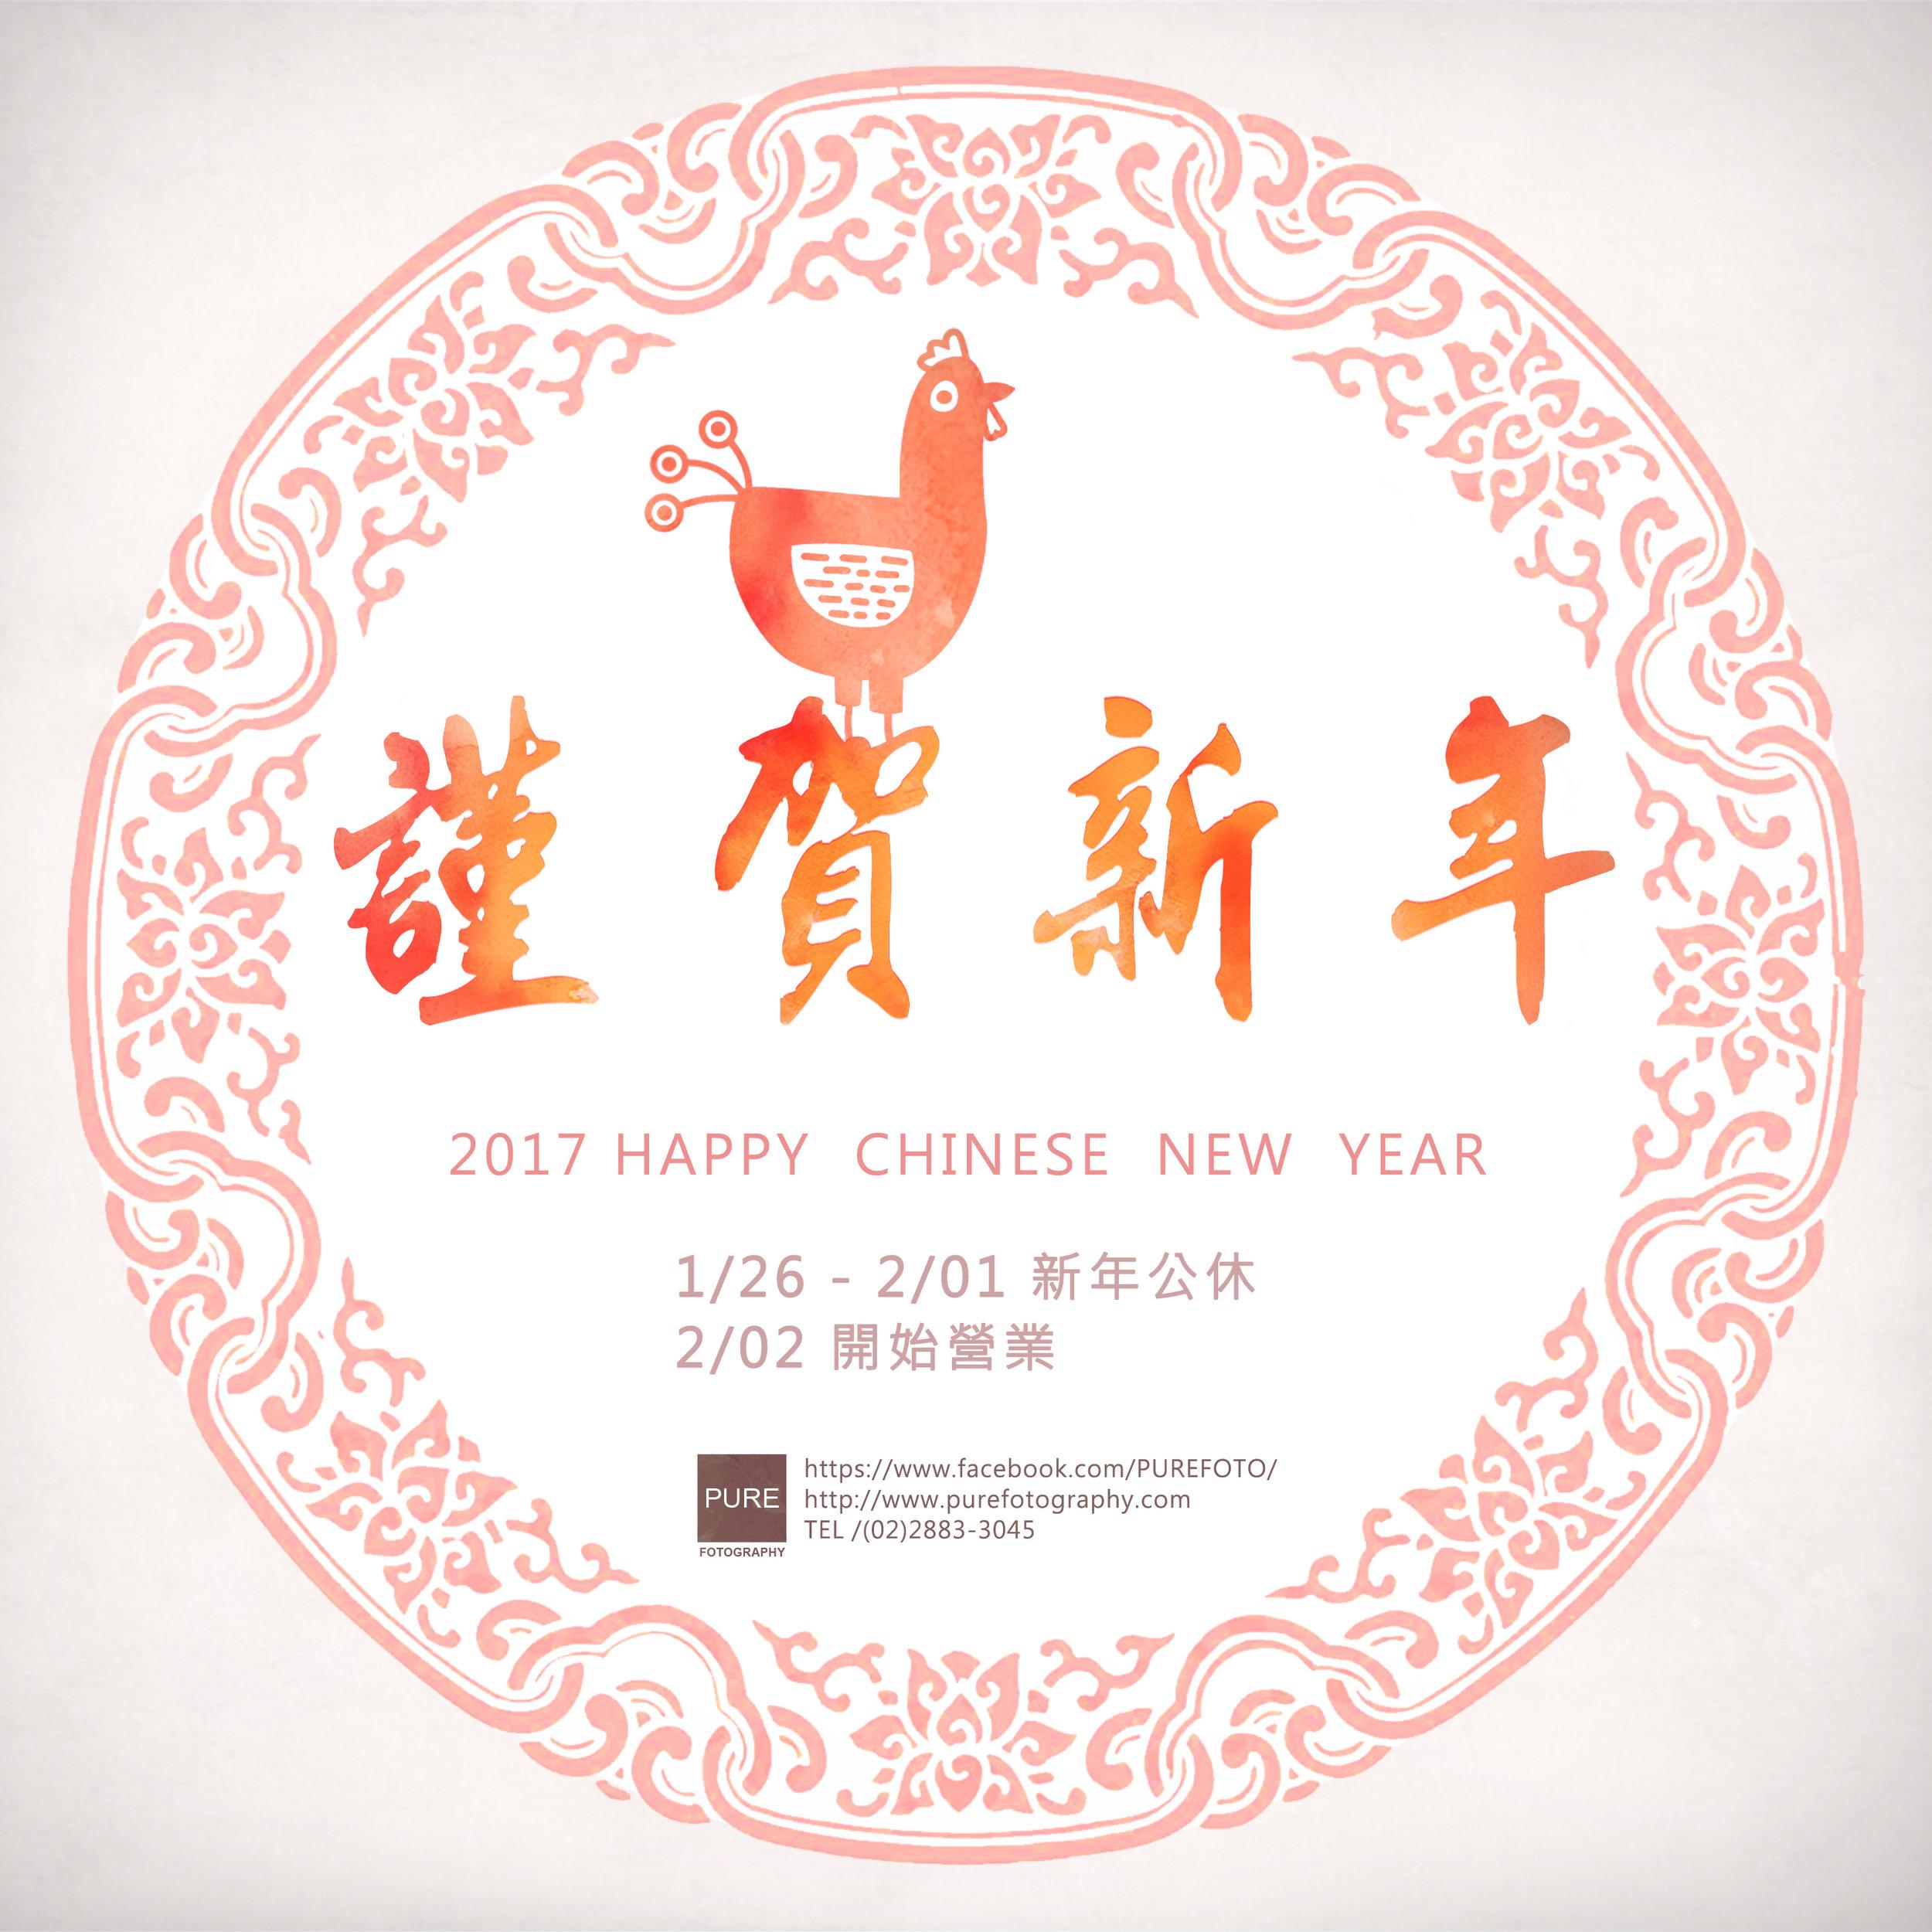 2017PURE攝影工作室祝新年快樂